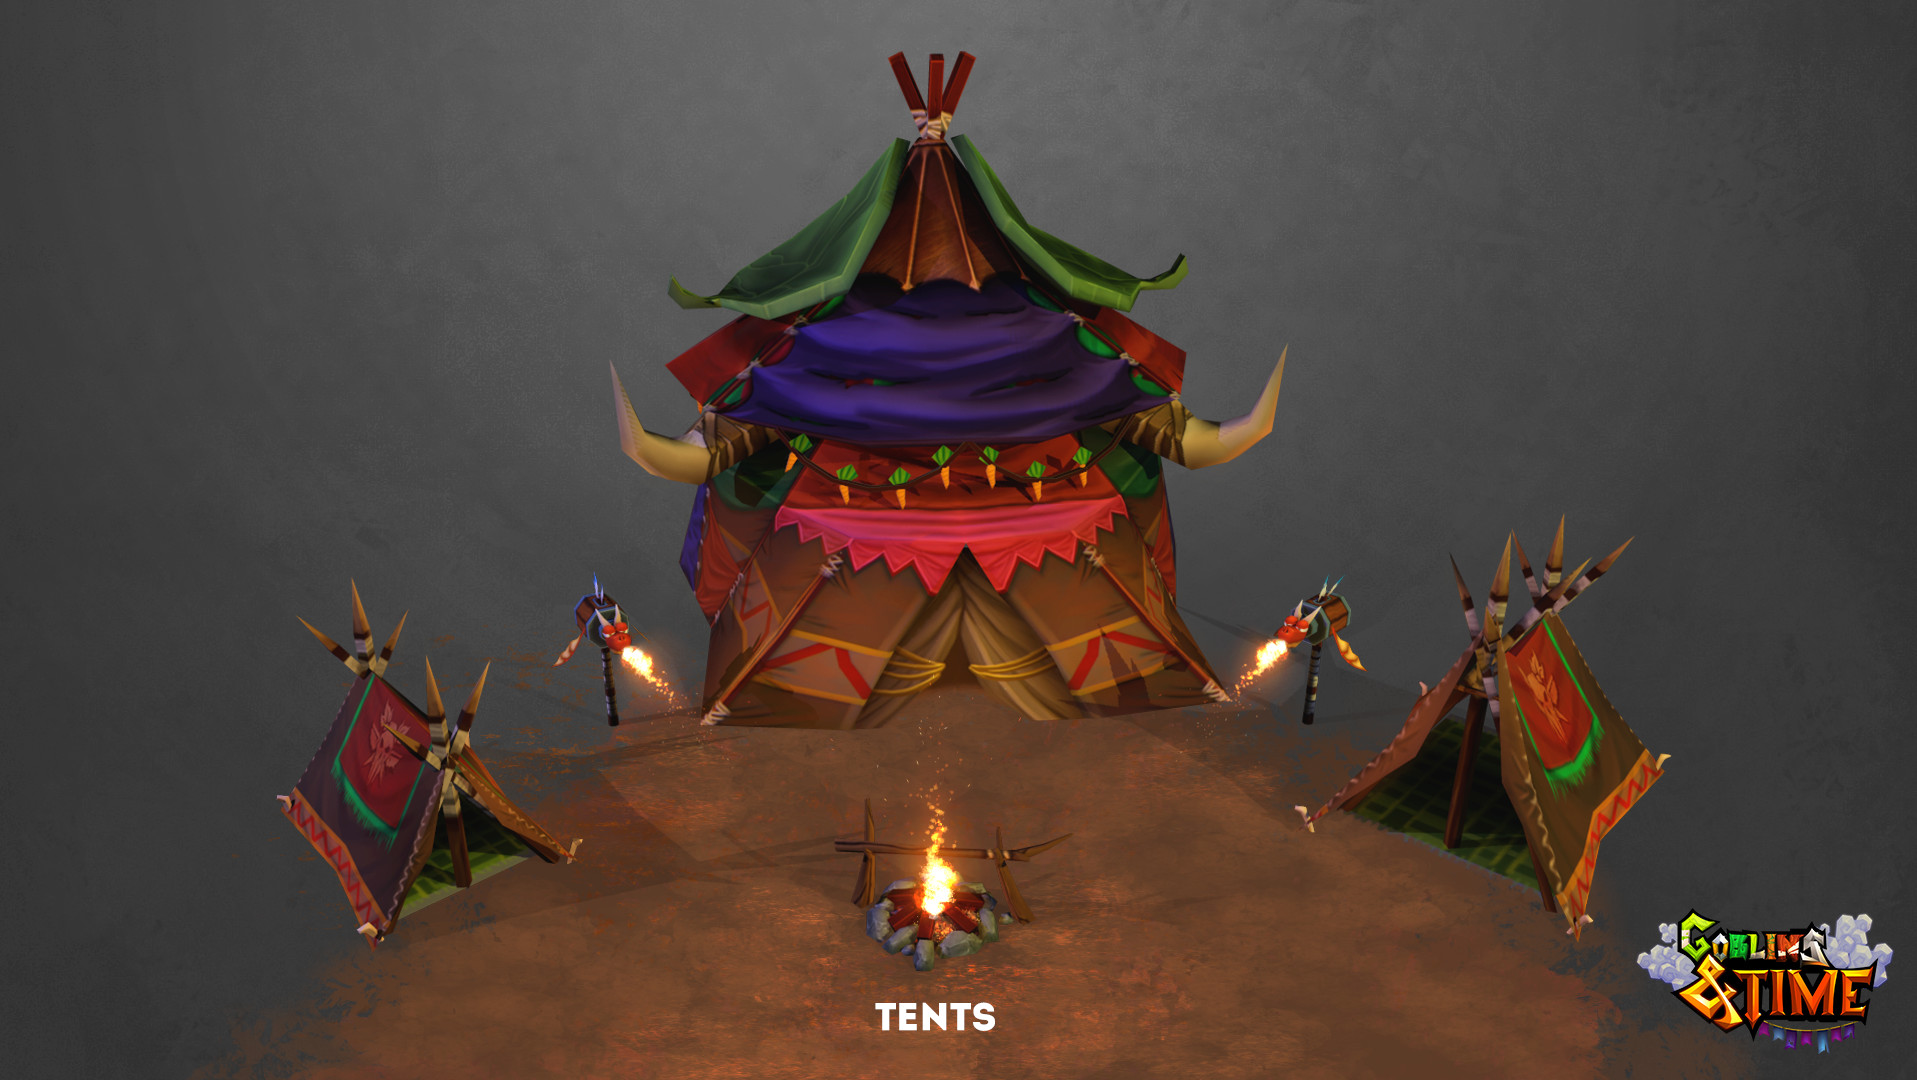 Caio perez tents